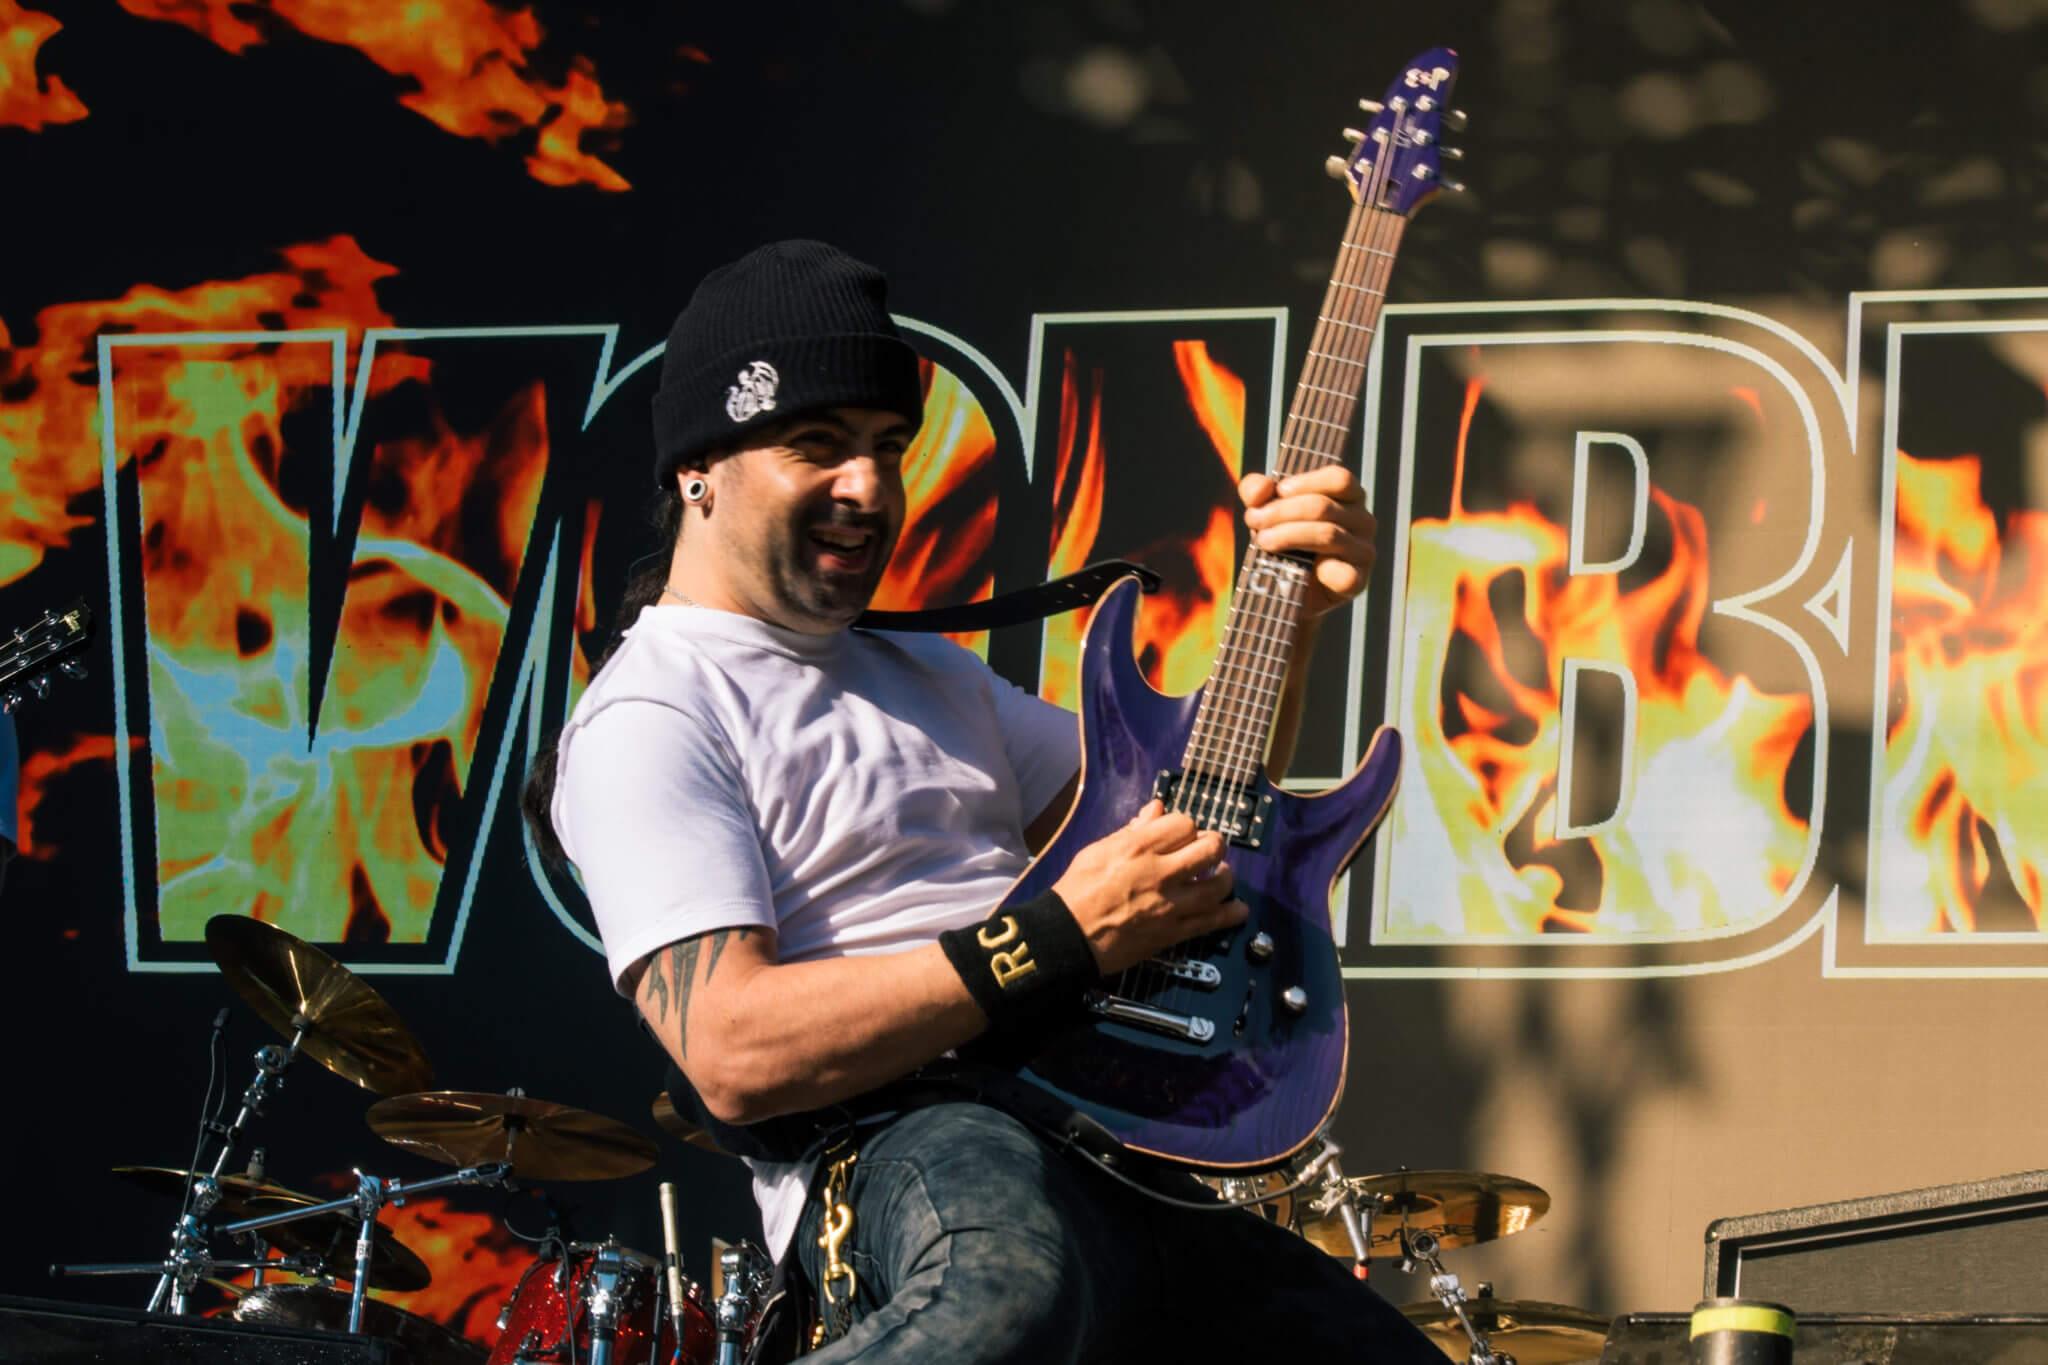 Volbeat @ Lollapalooza Chile 2018. Fotografía: Lukas Cruzat para mor.bo